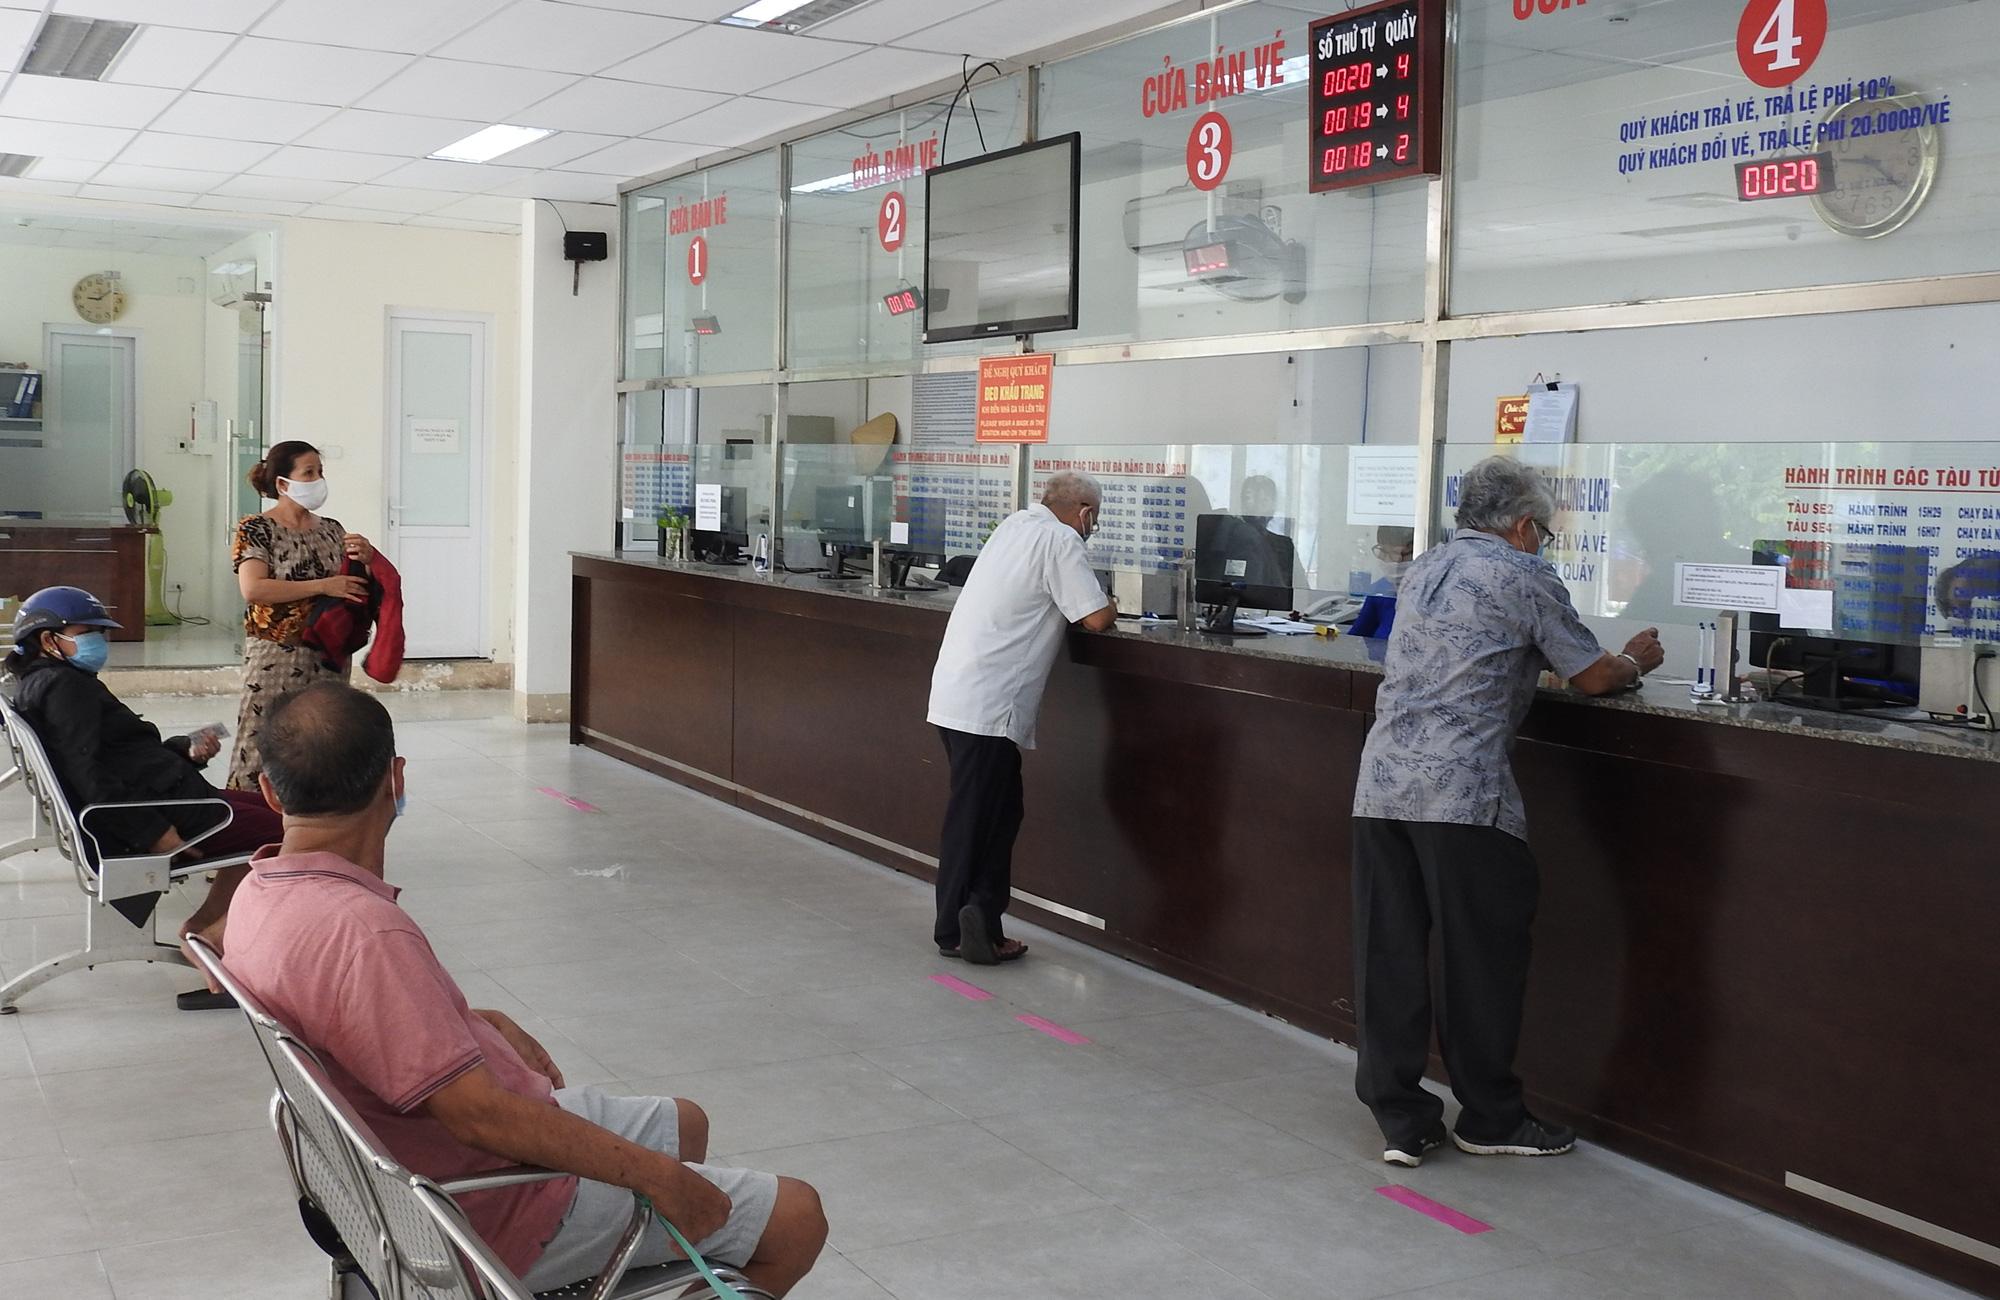 People buy train tickets at the Da Nang Railway Station in Da Nang City, Vietnam, September 7, 2020. Photo: V.Hung / Tuoi Tre